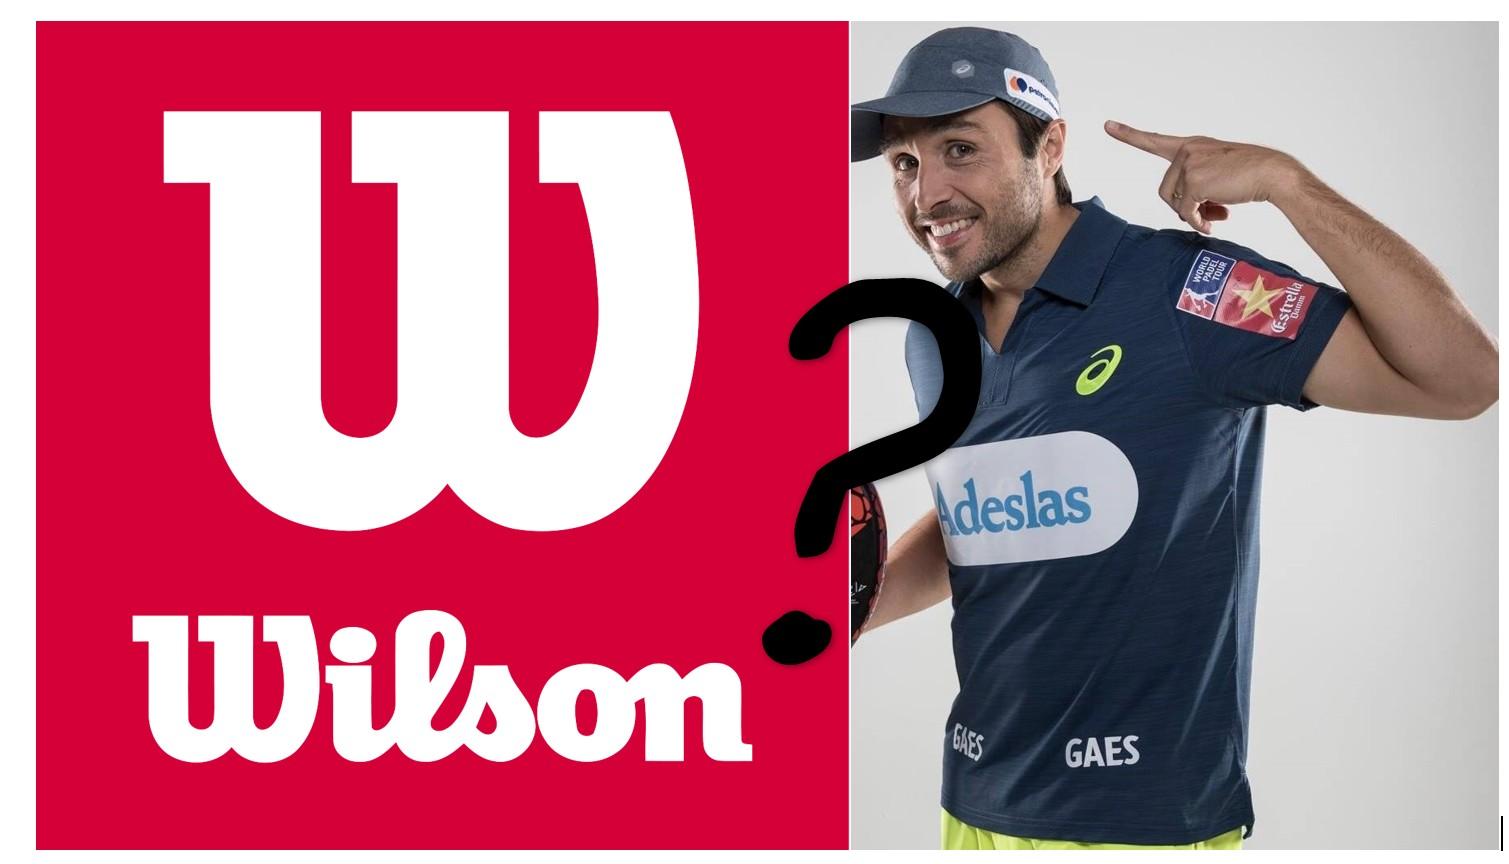 Wilson Padel Fernando Belasteguin 2020 | wilson padel fernando belasteguin